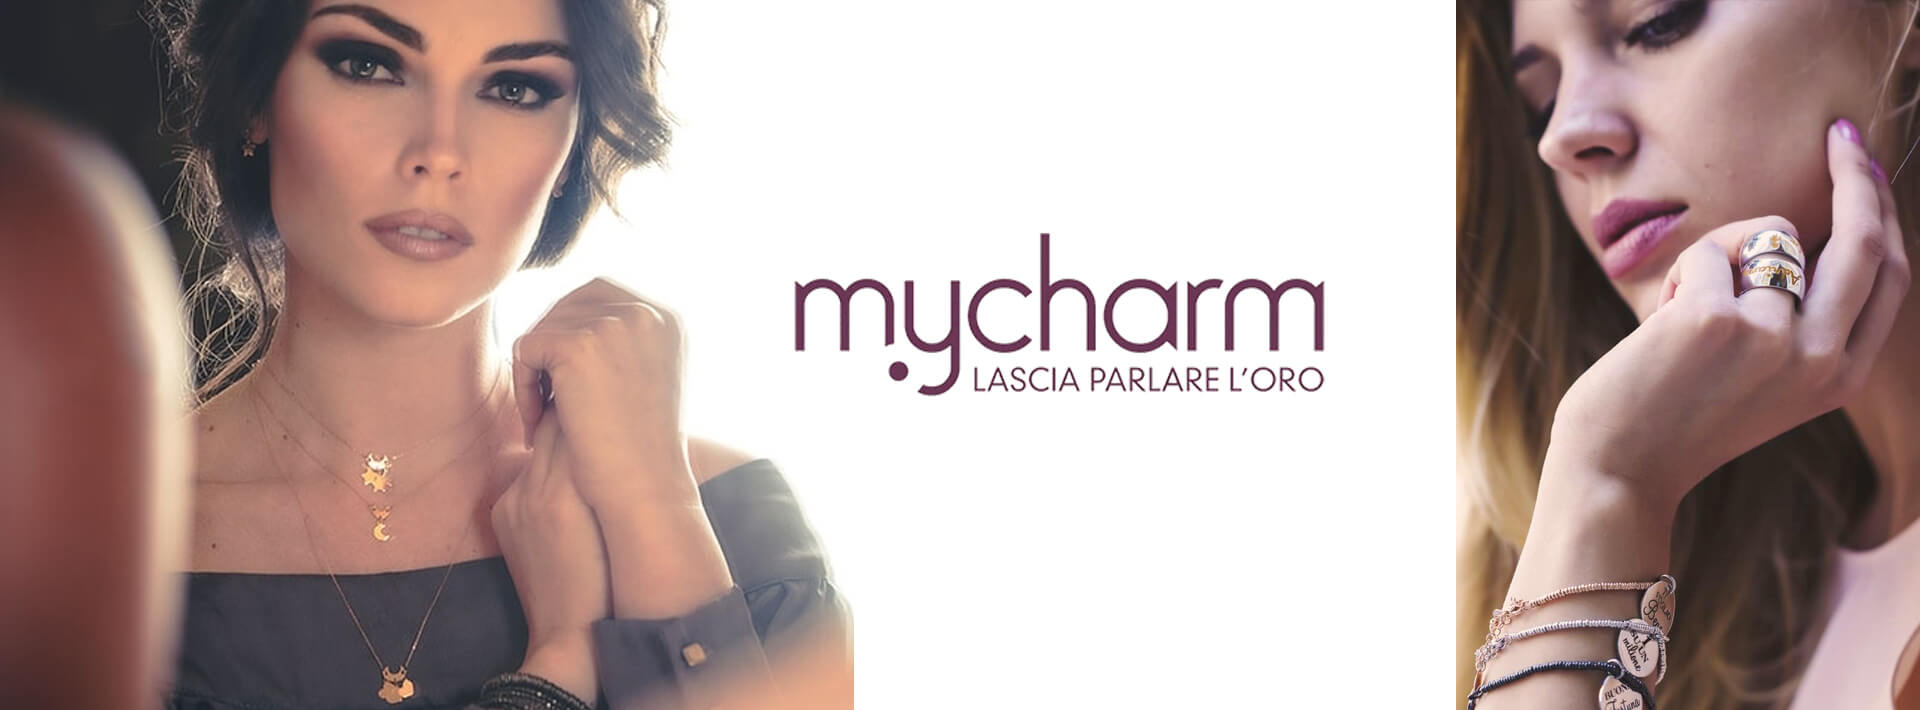 Logo MyCharm gioielli. Bellipario Gioielleria